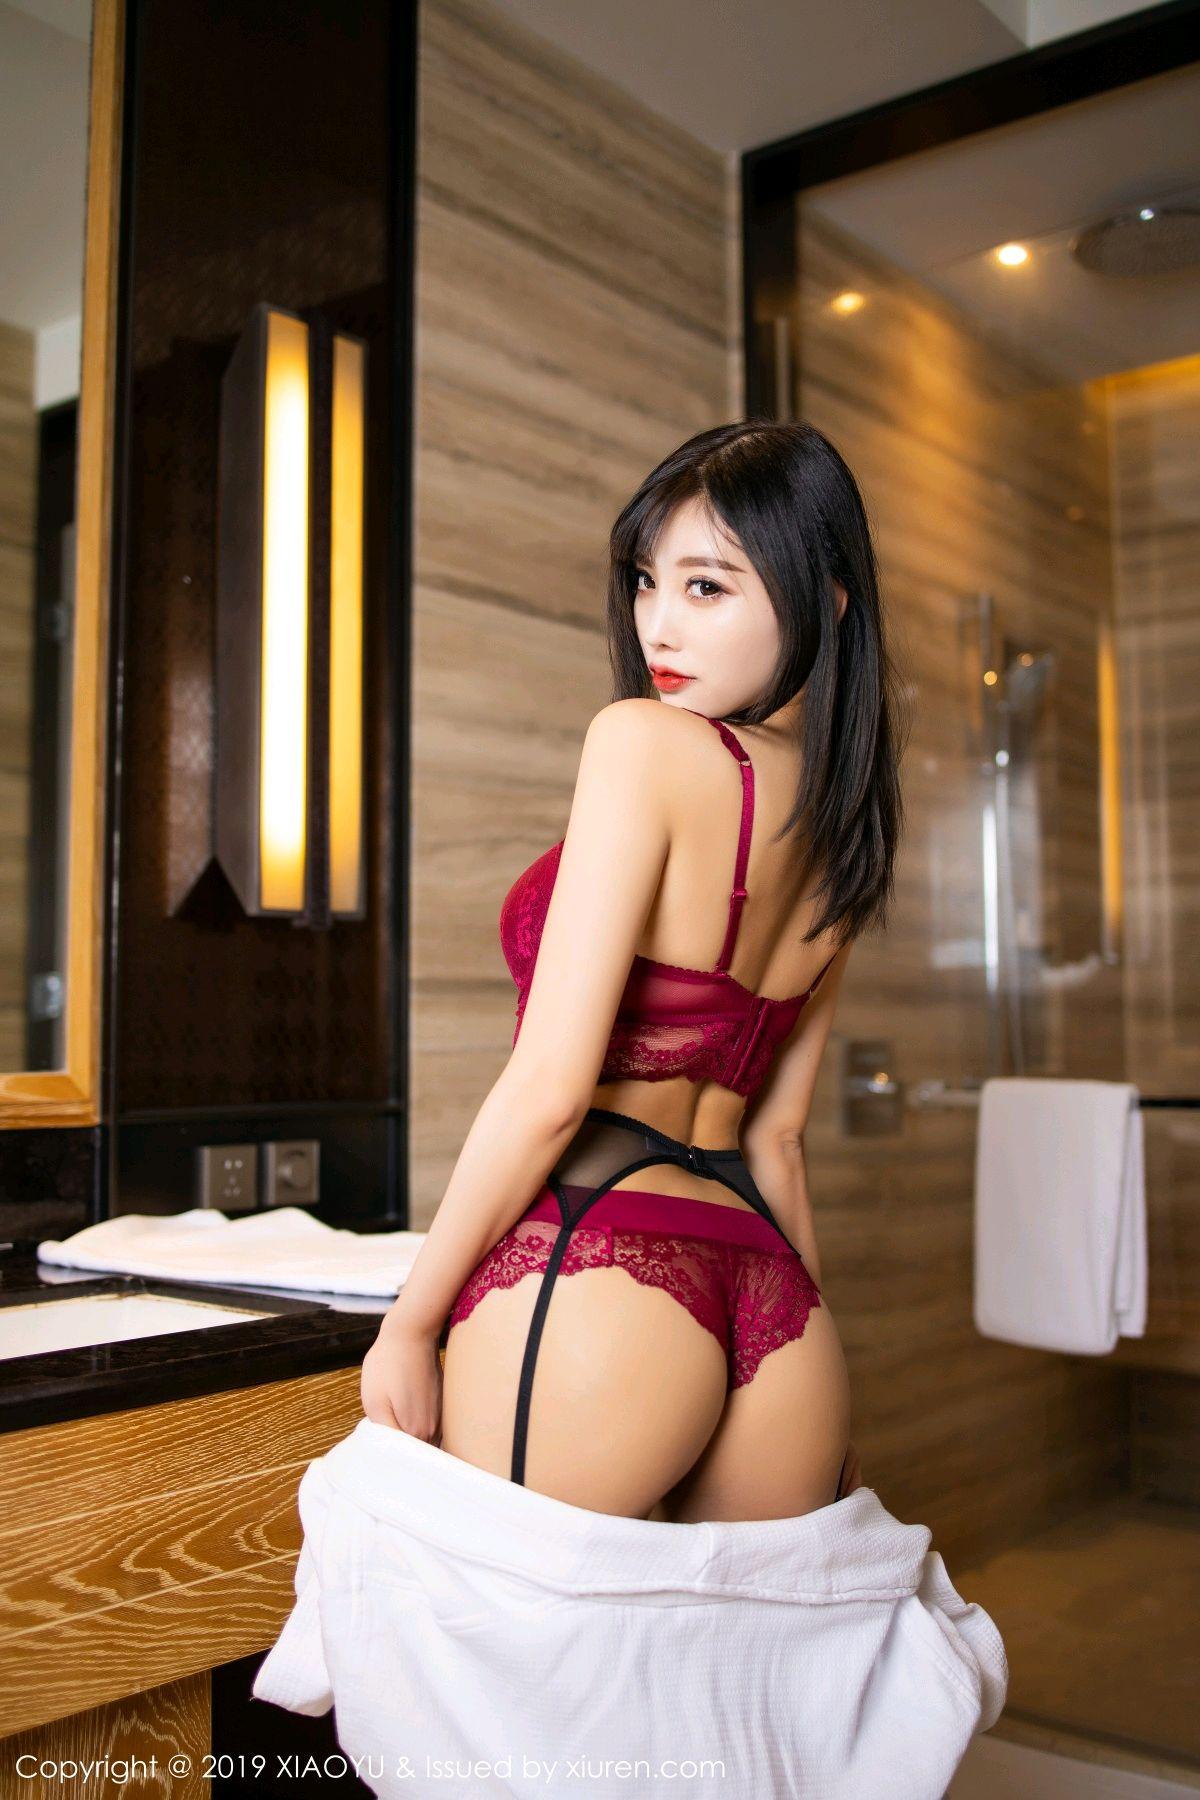 [XiaoYu] Vol.153 Yang Chen Chen 30P, Bathroom, Black Silk, Underwear, XiaoYu, Yang Chen Chen